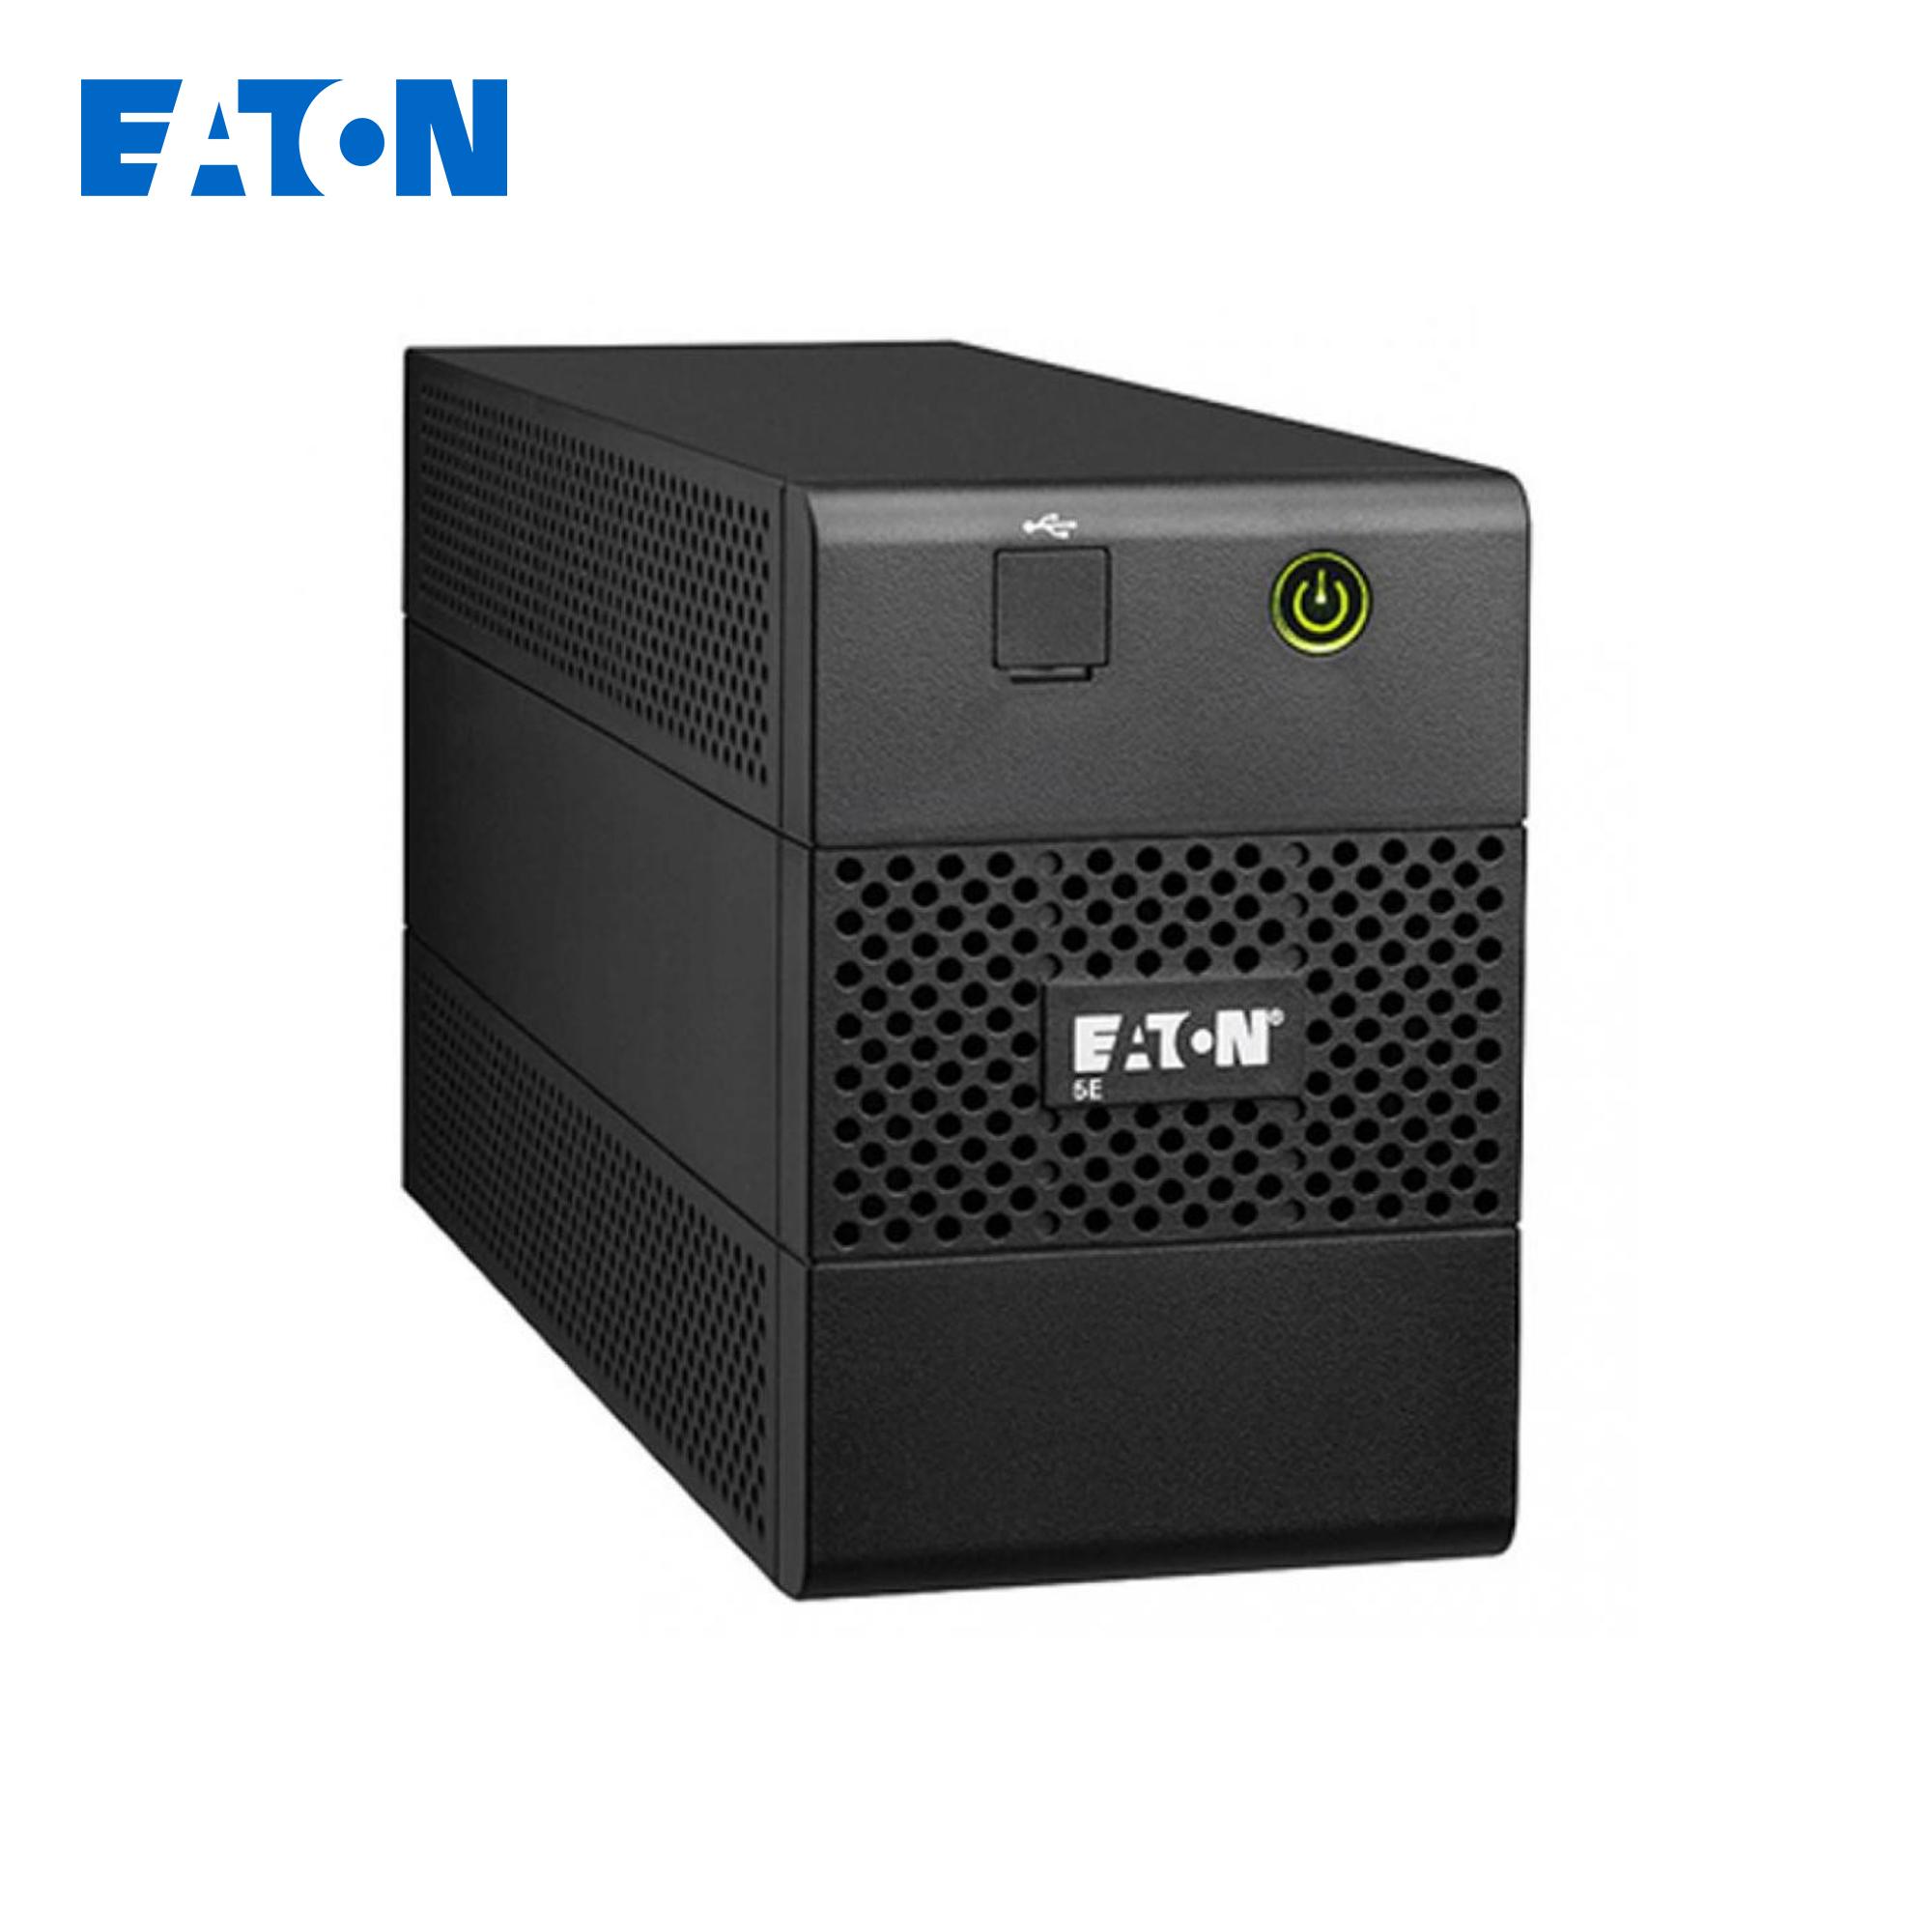 Eaton 5E 1100VA USB